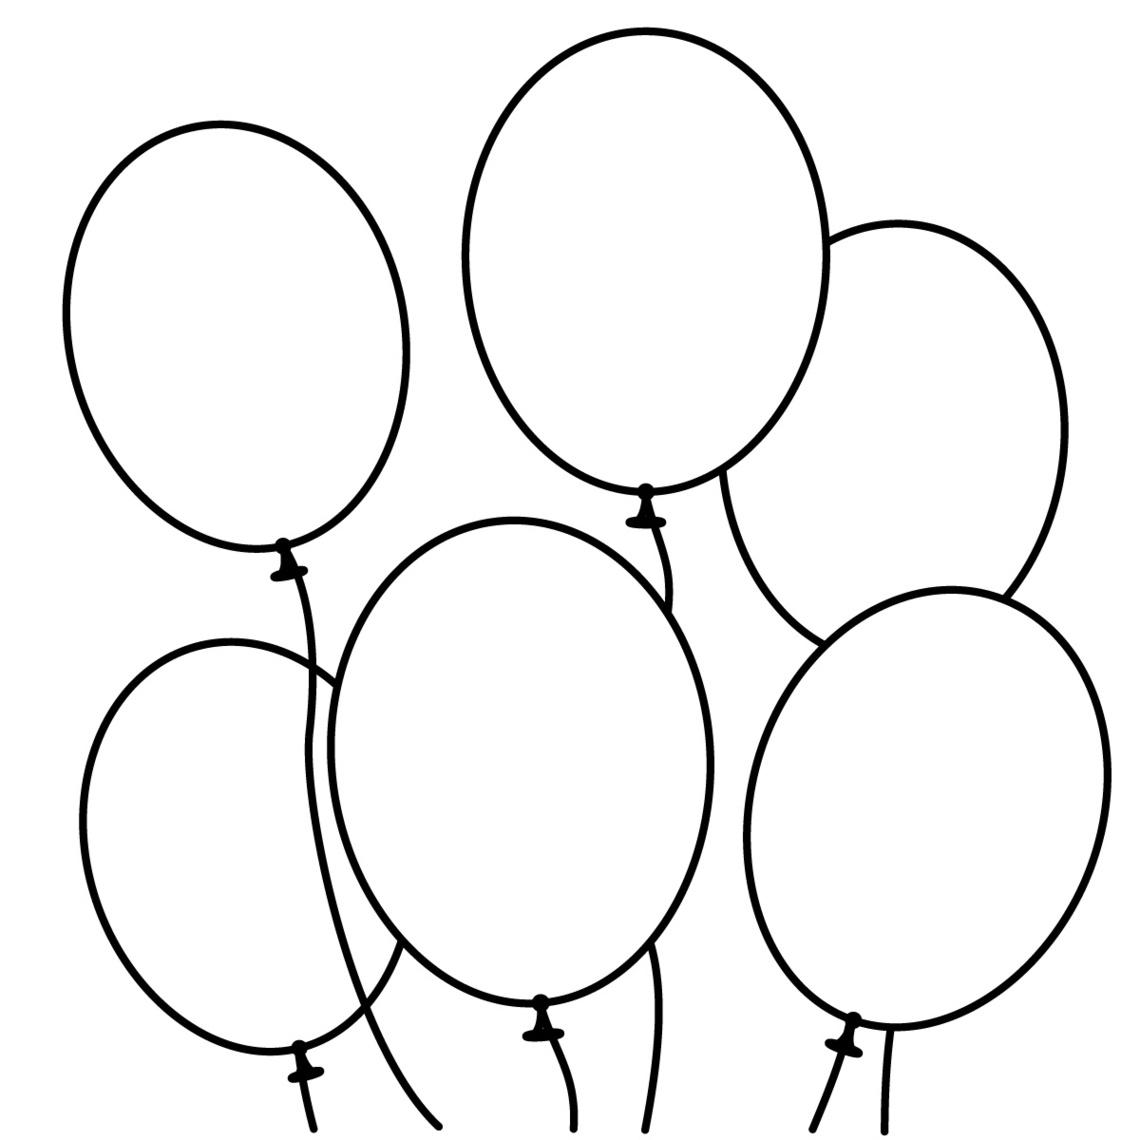 Free Black Balloons Cliparts, Download Free Clip Art, Free Clip Art.